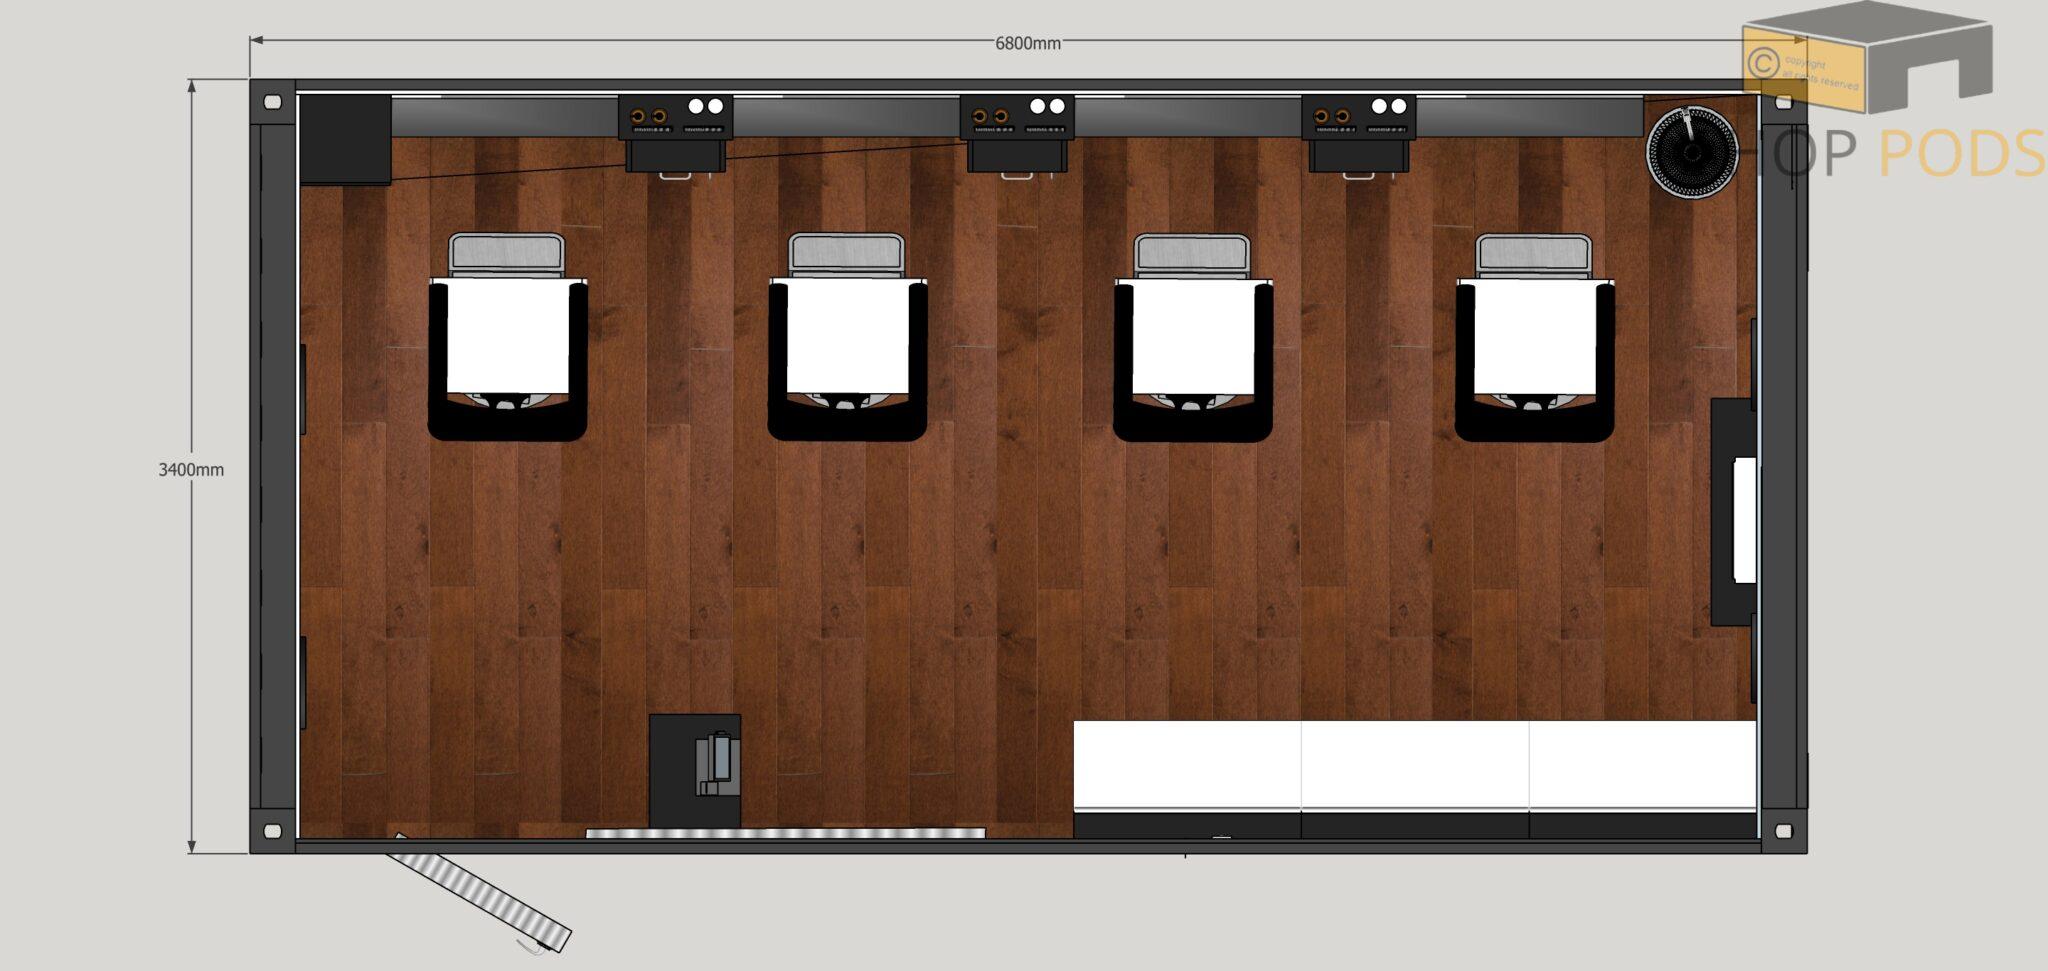 Cutbox 6.8m x 3.4m Pod4